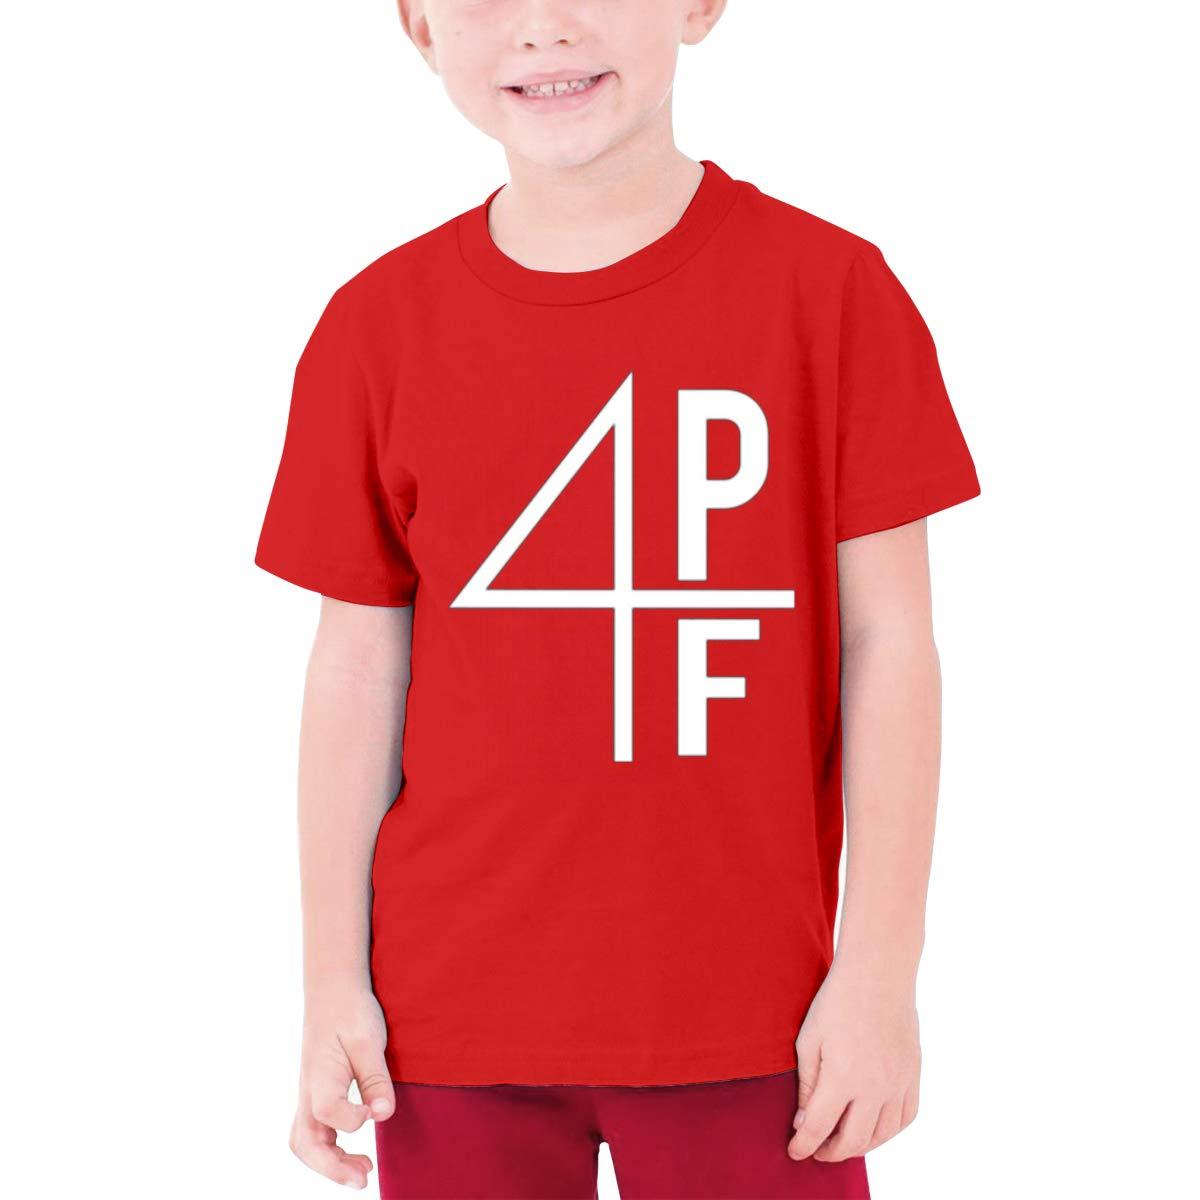 Teenage Lil Baby 4pf Round Neck Tshirtnovelty Short Sleeves Tee Red